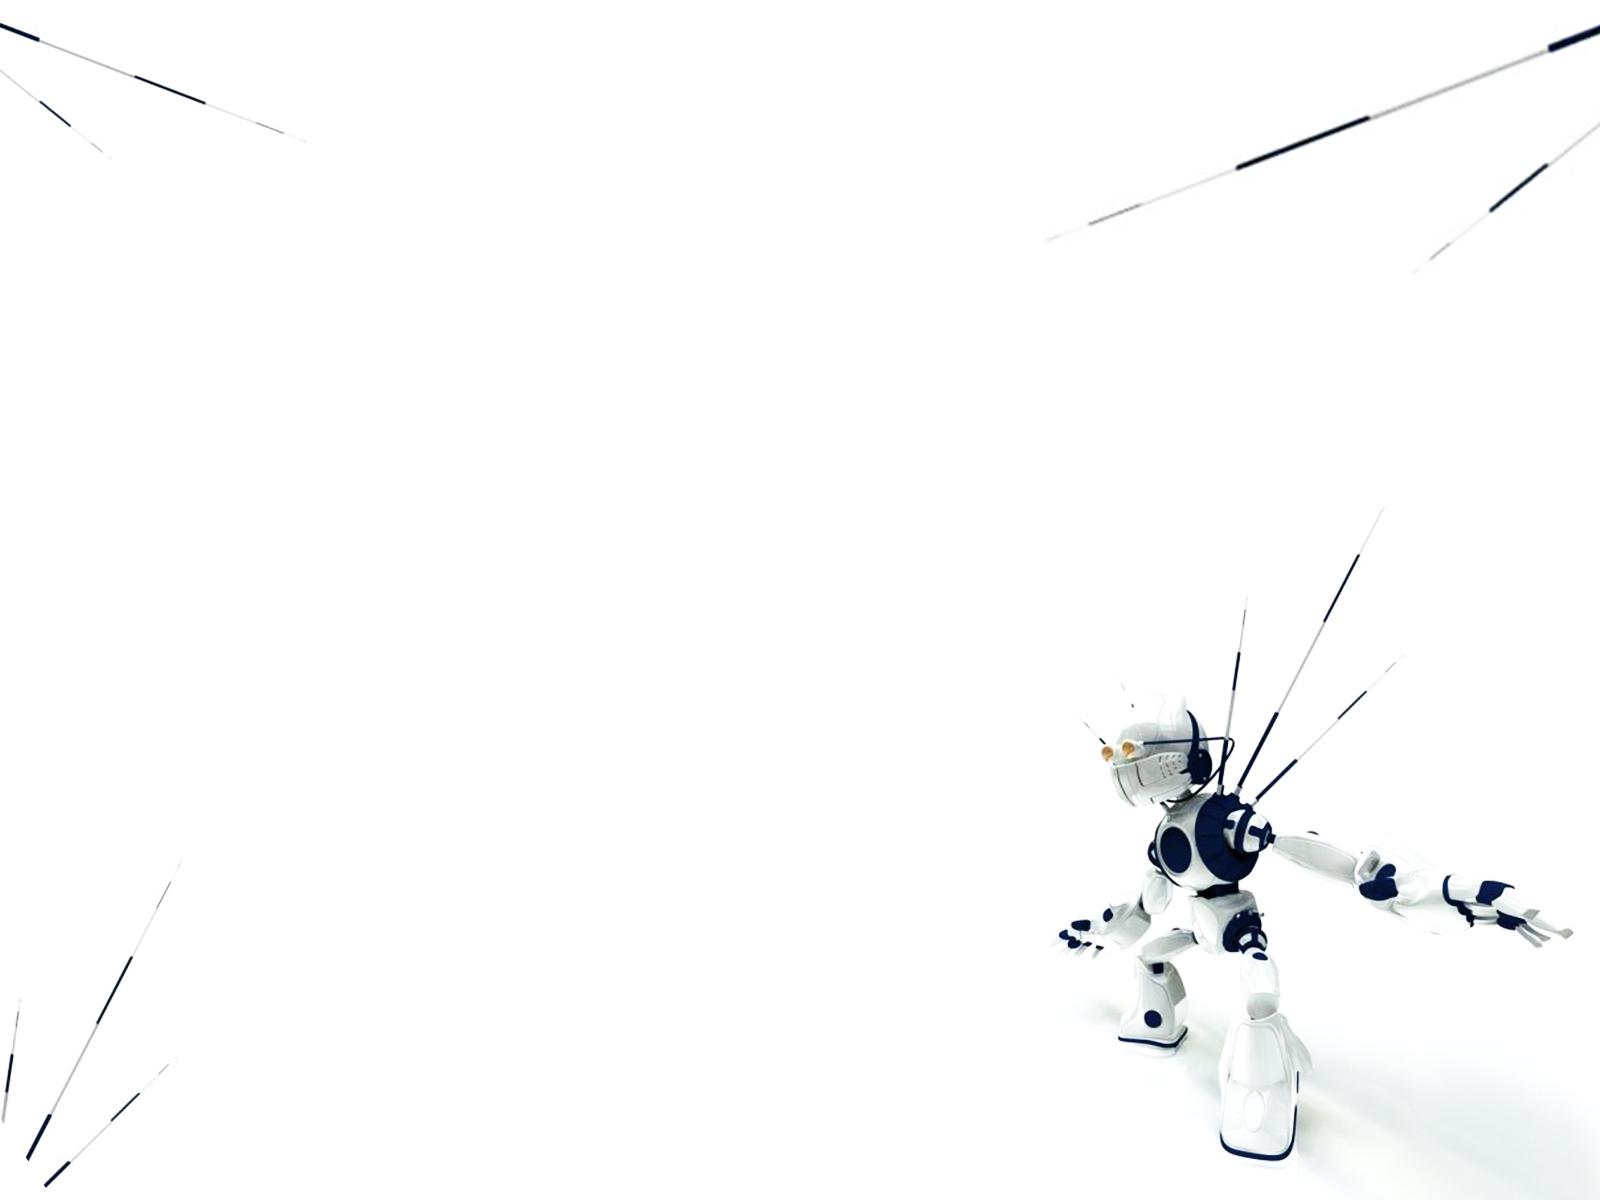 Smart Robotic Backgrounds | 3D, Cartoon, White Templates ...